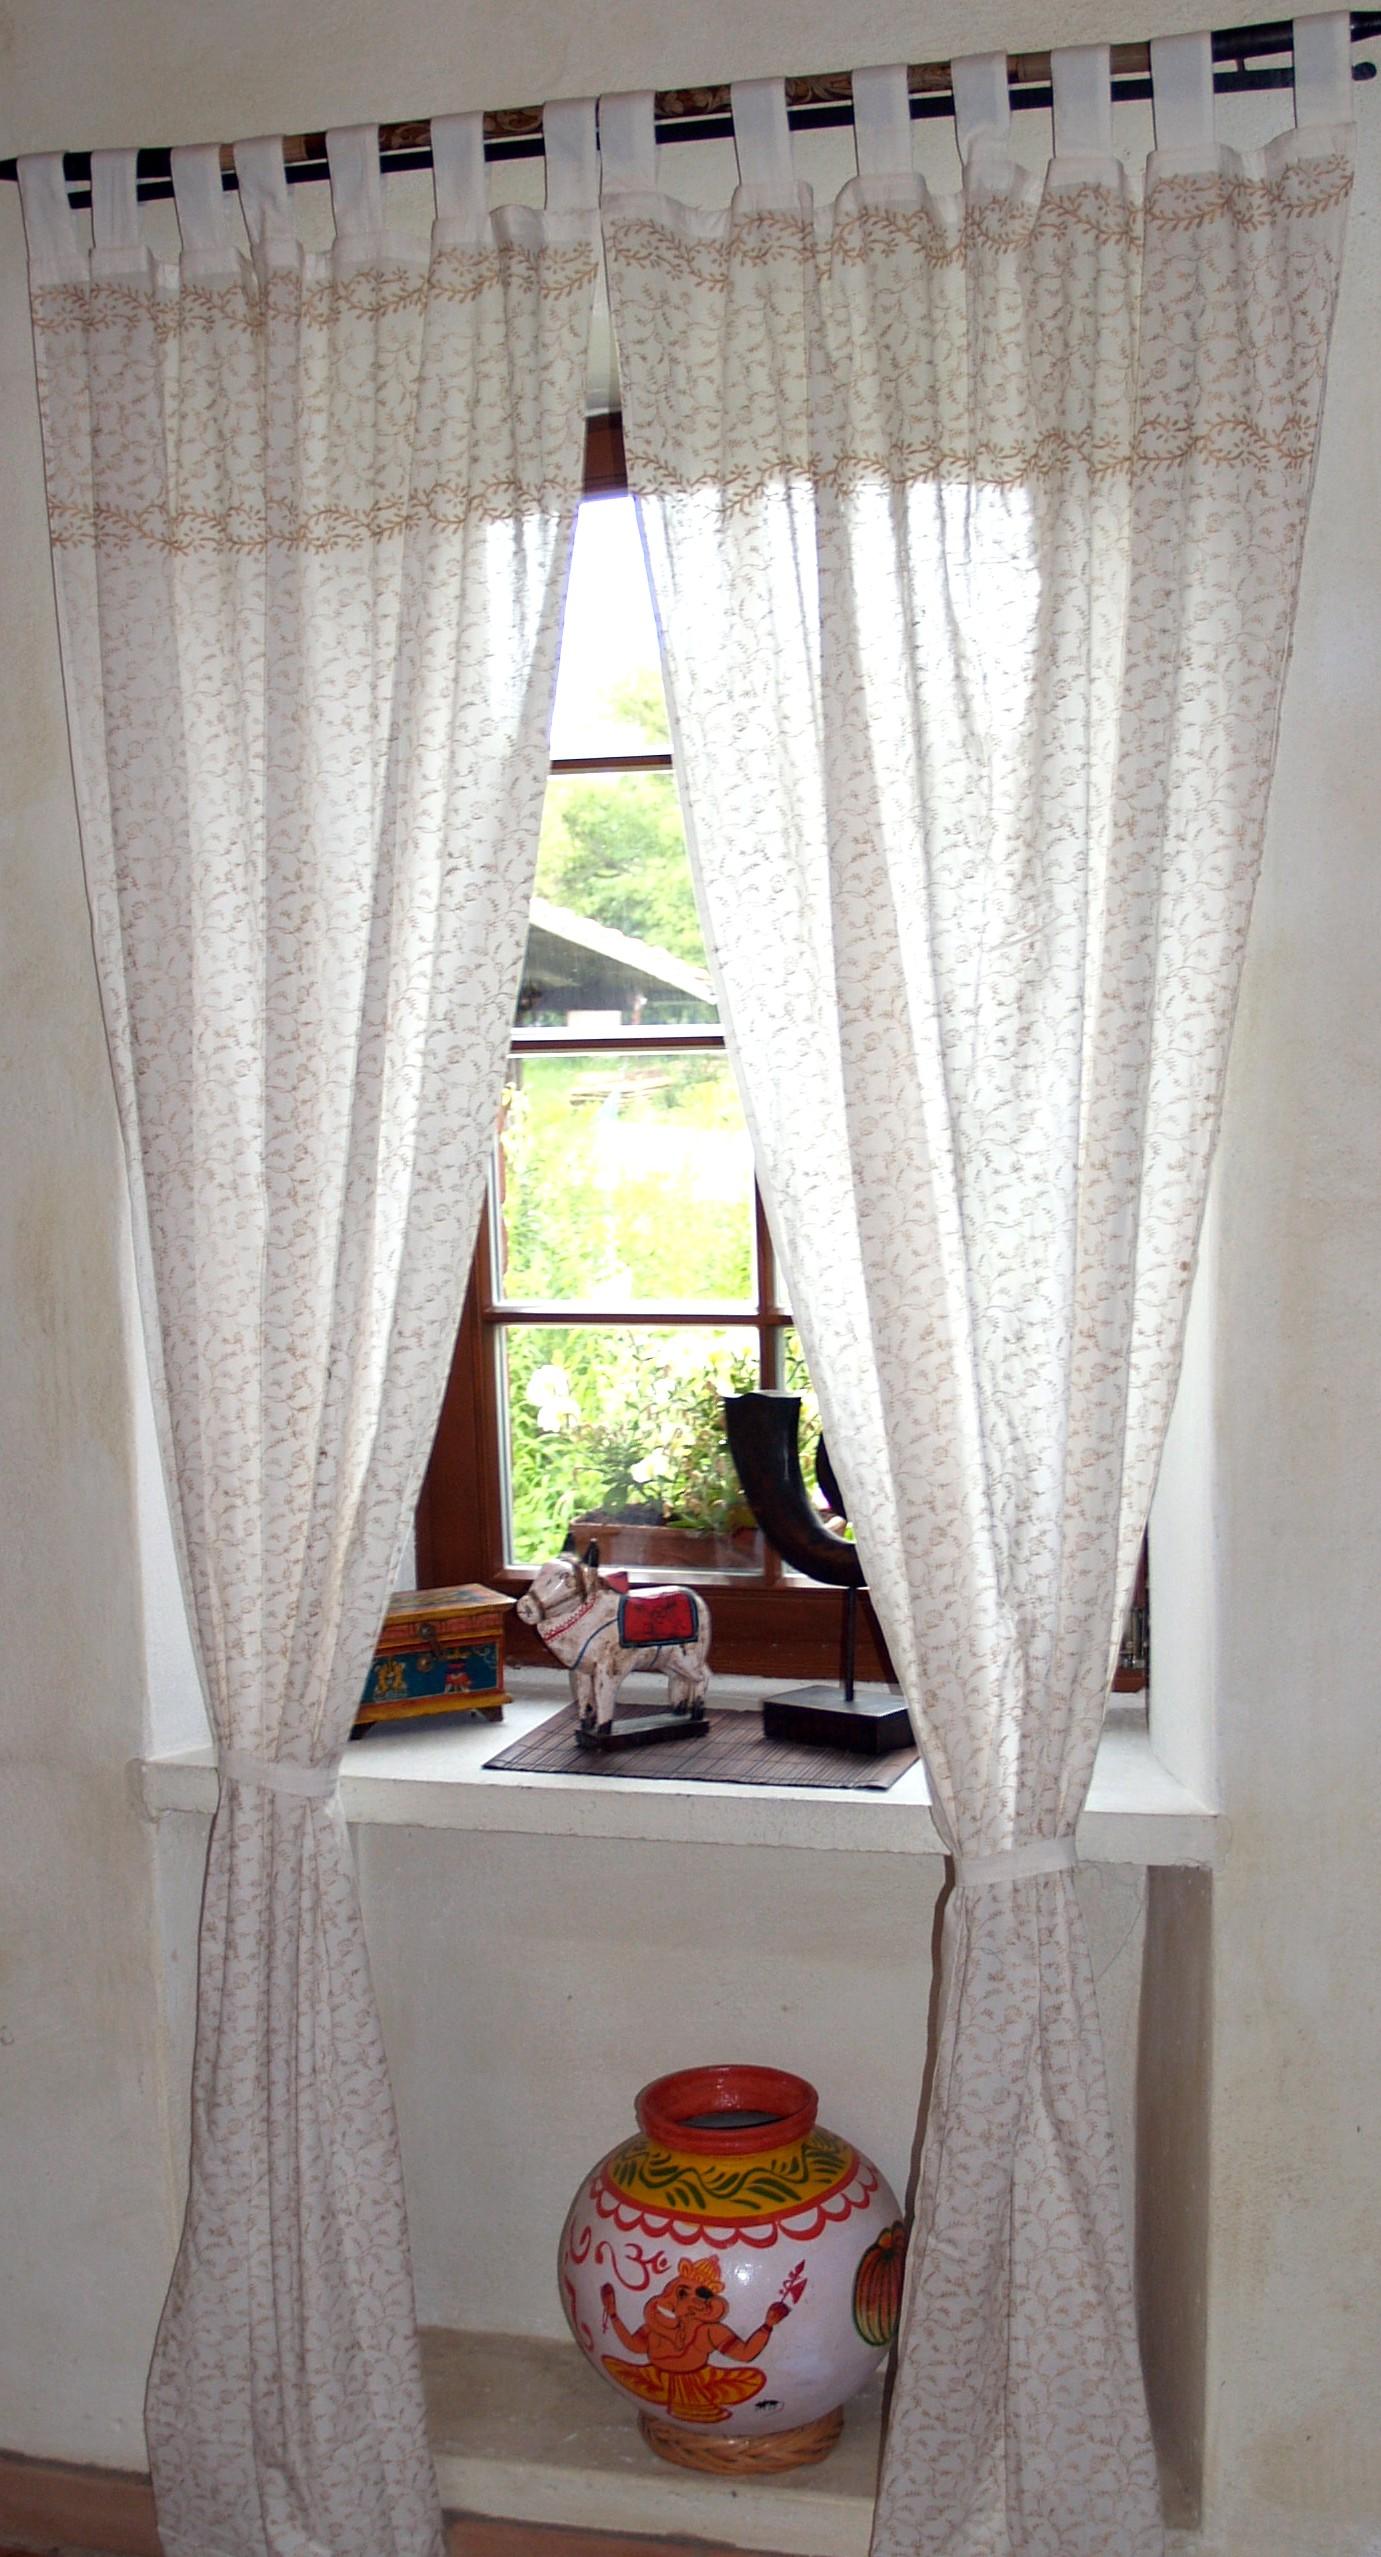 orientalische vorhang gardine 1 paar vorh nge gardinen golddruck 100 cm. Black Bedroom Furniture Sets. Home Design Ideas